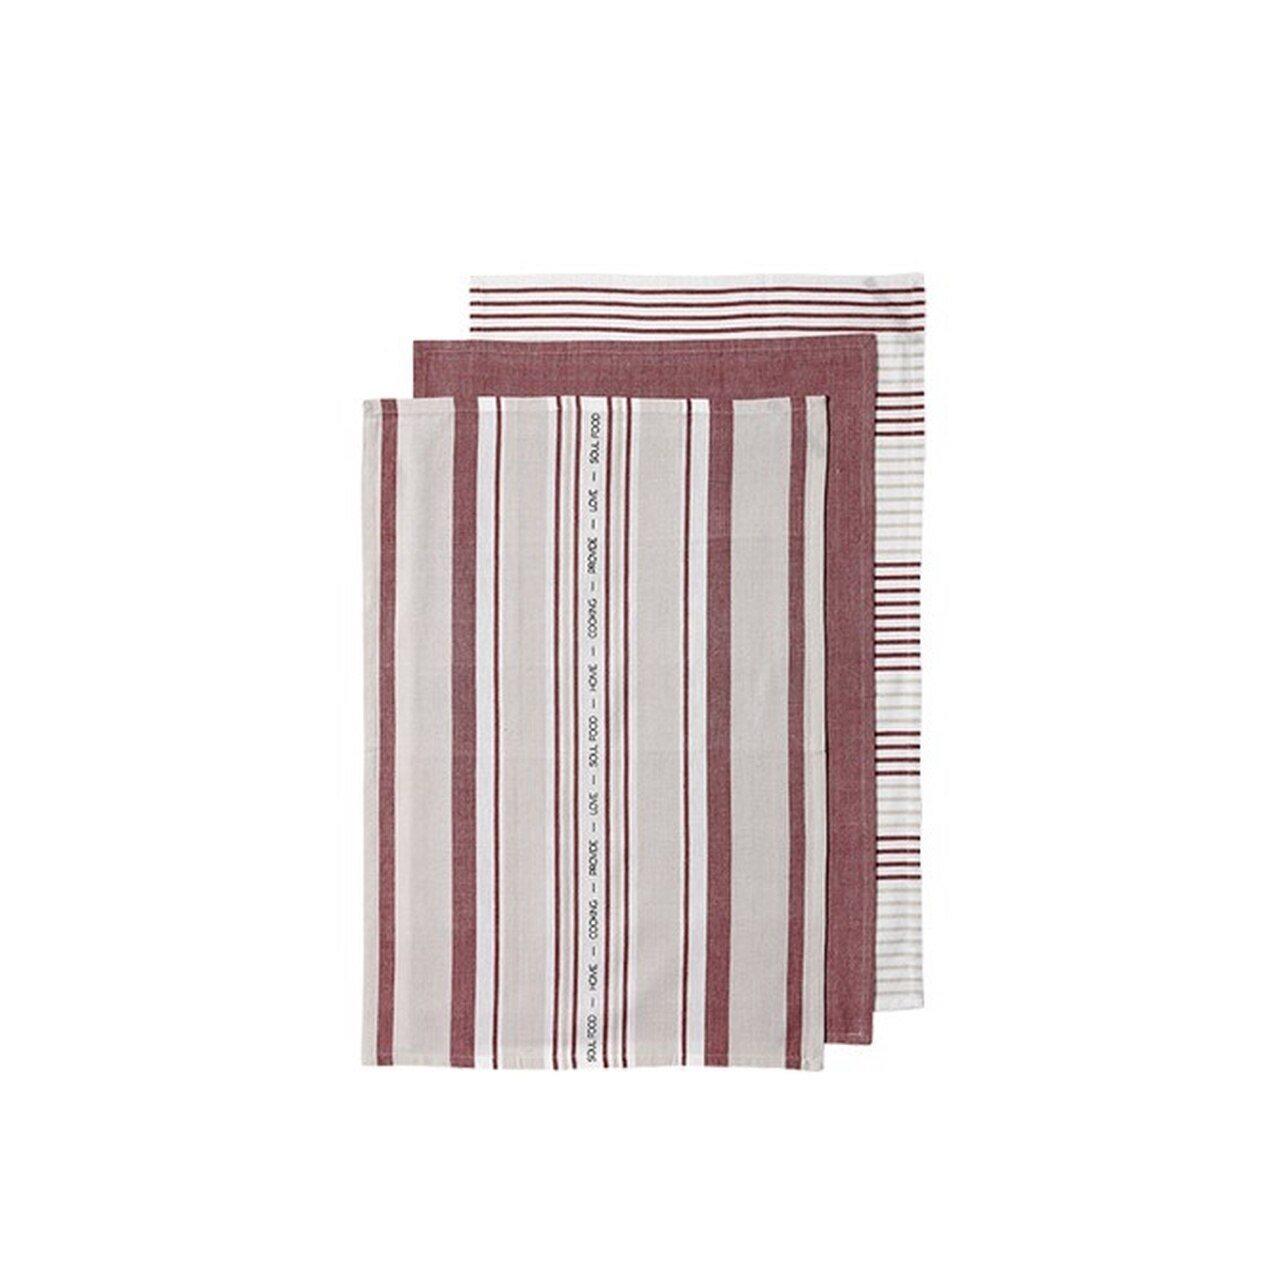 Ladelle Πετσέτες Κουζίνας Βαμβακερές Σκούρο Ροζ Abode Stripe 45X70cm- Σετ 3 Τεμάχια